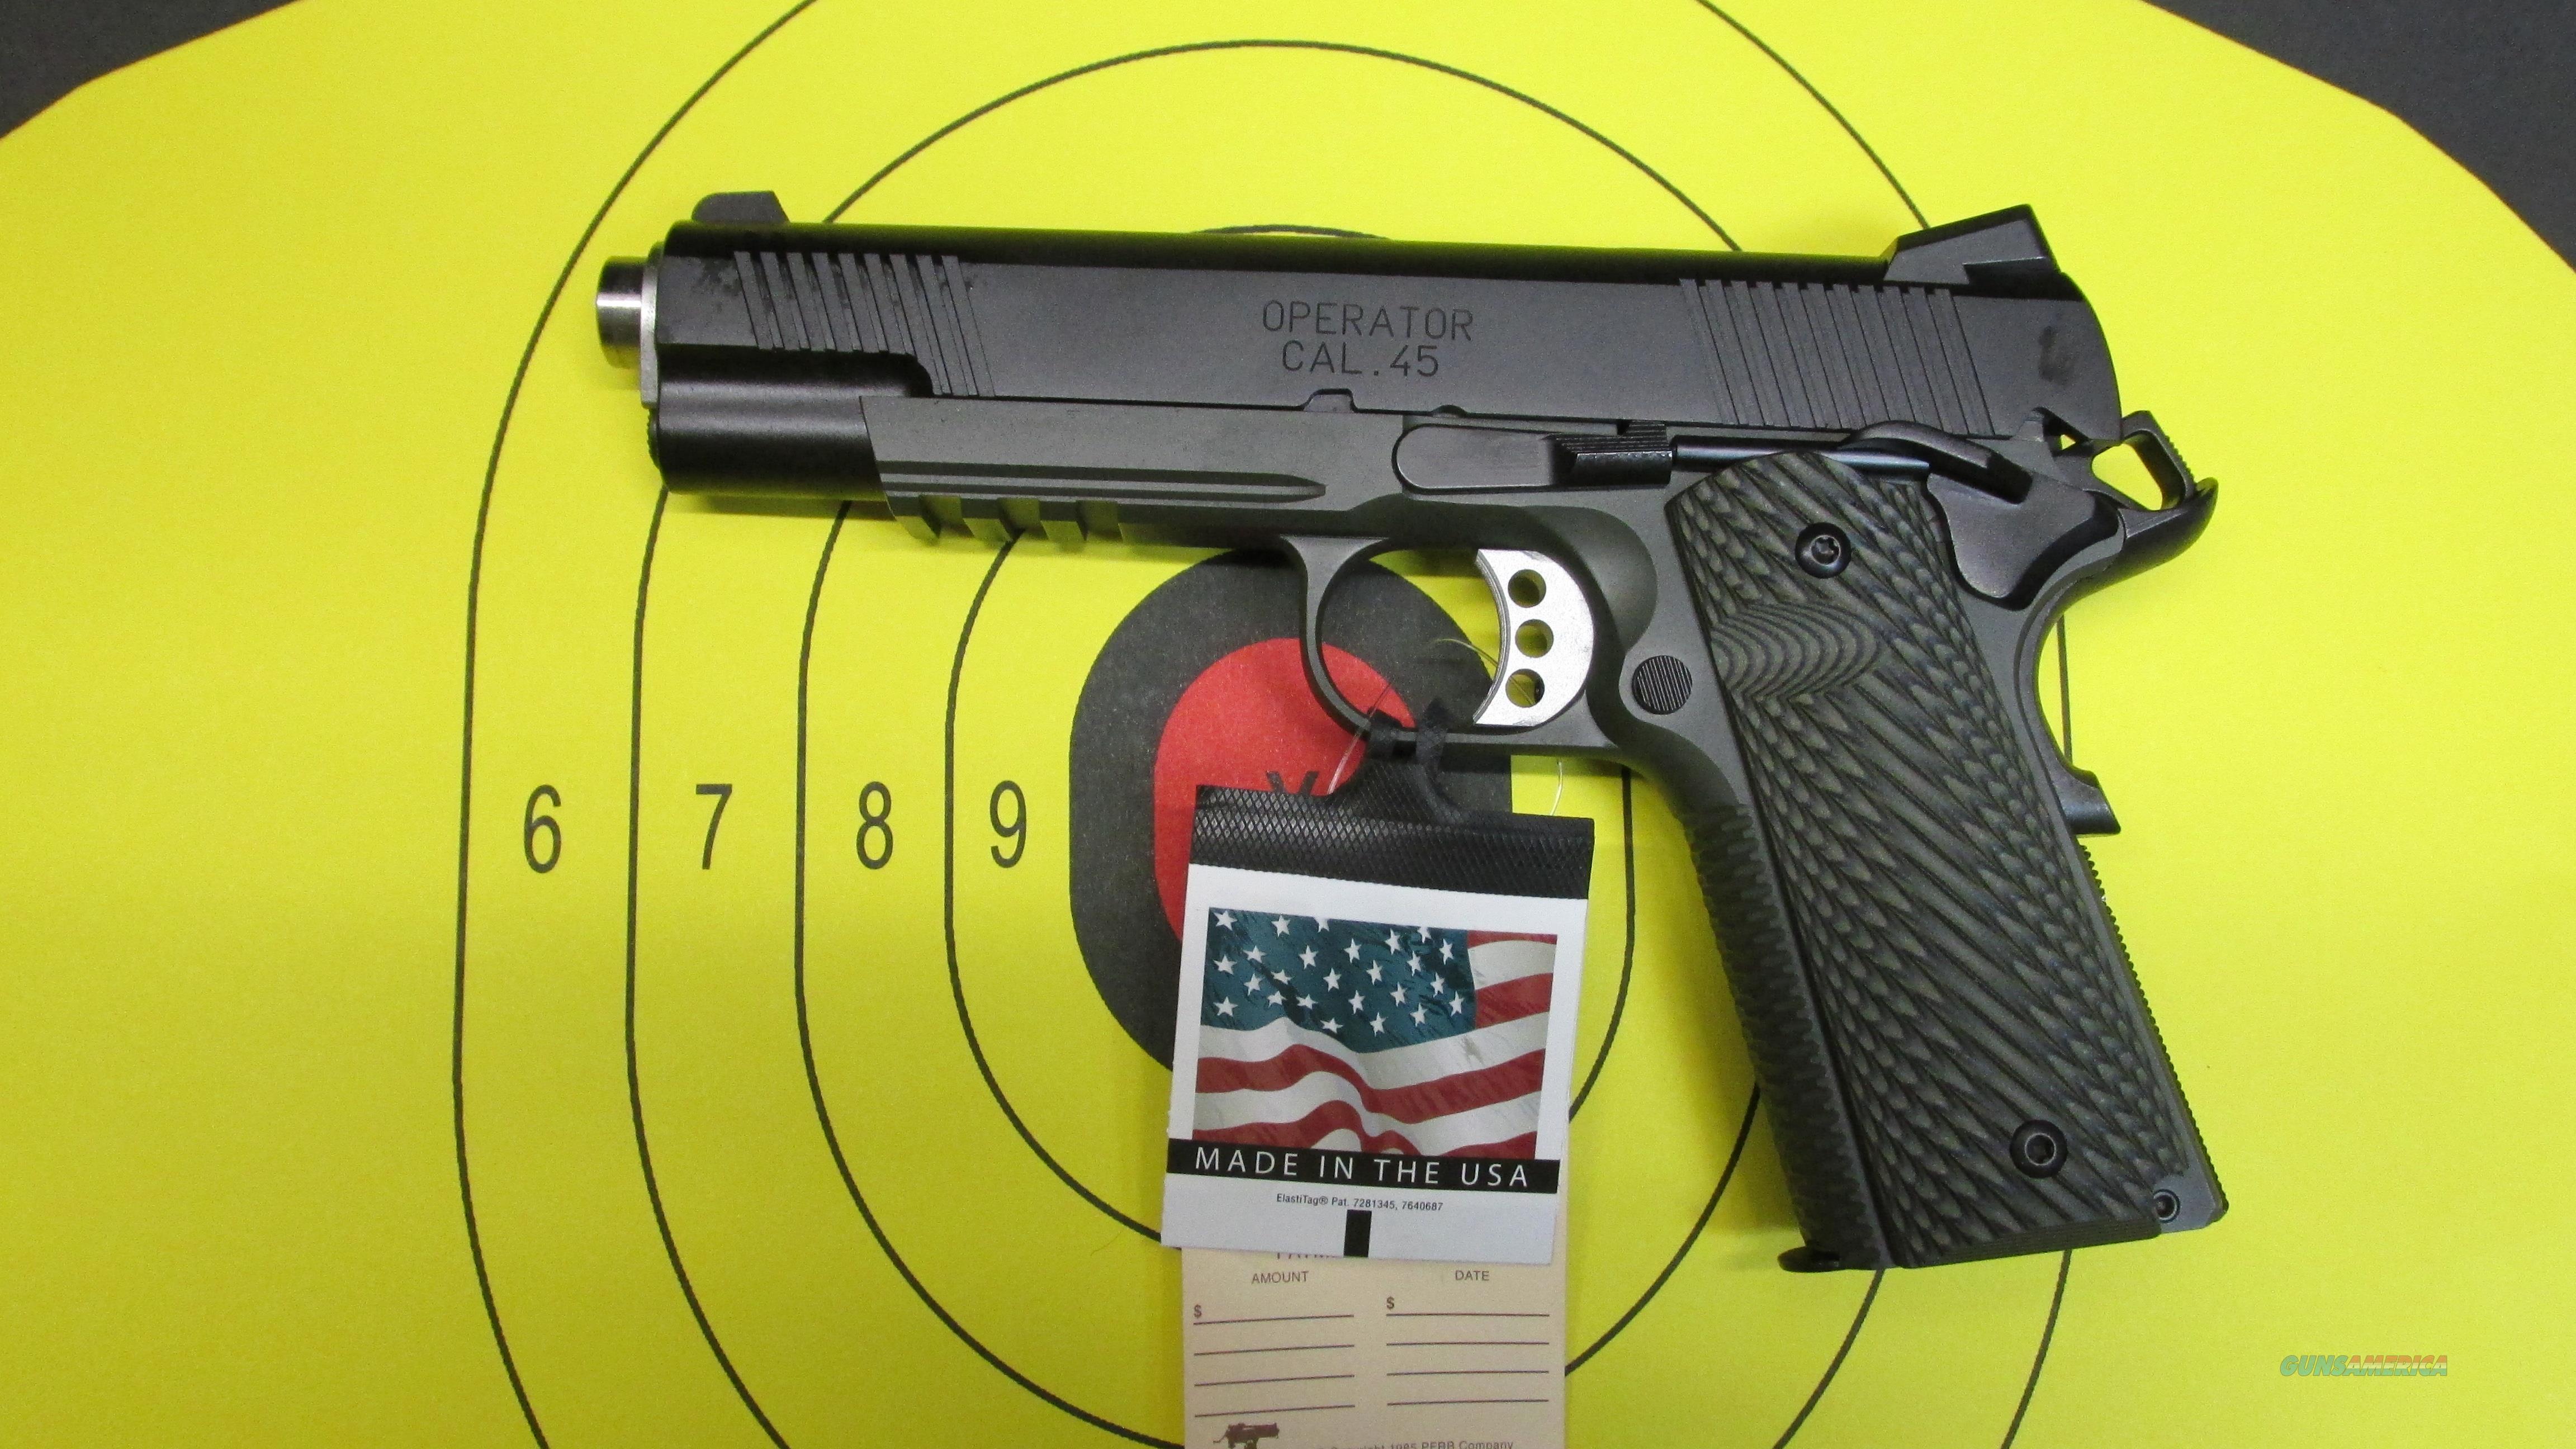 Springfield 1911 45 ACP Loaded Operator ODG  Guns > Pistols > Springfield Armory Pistols > 1911 Type